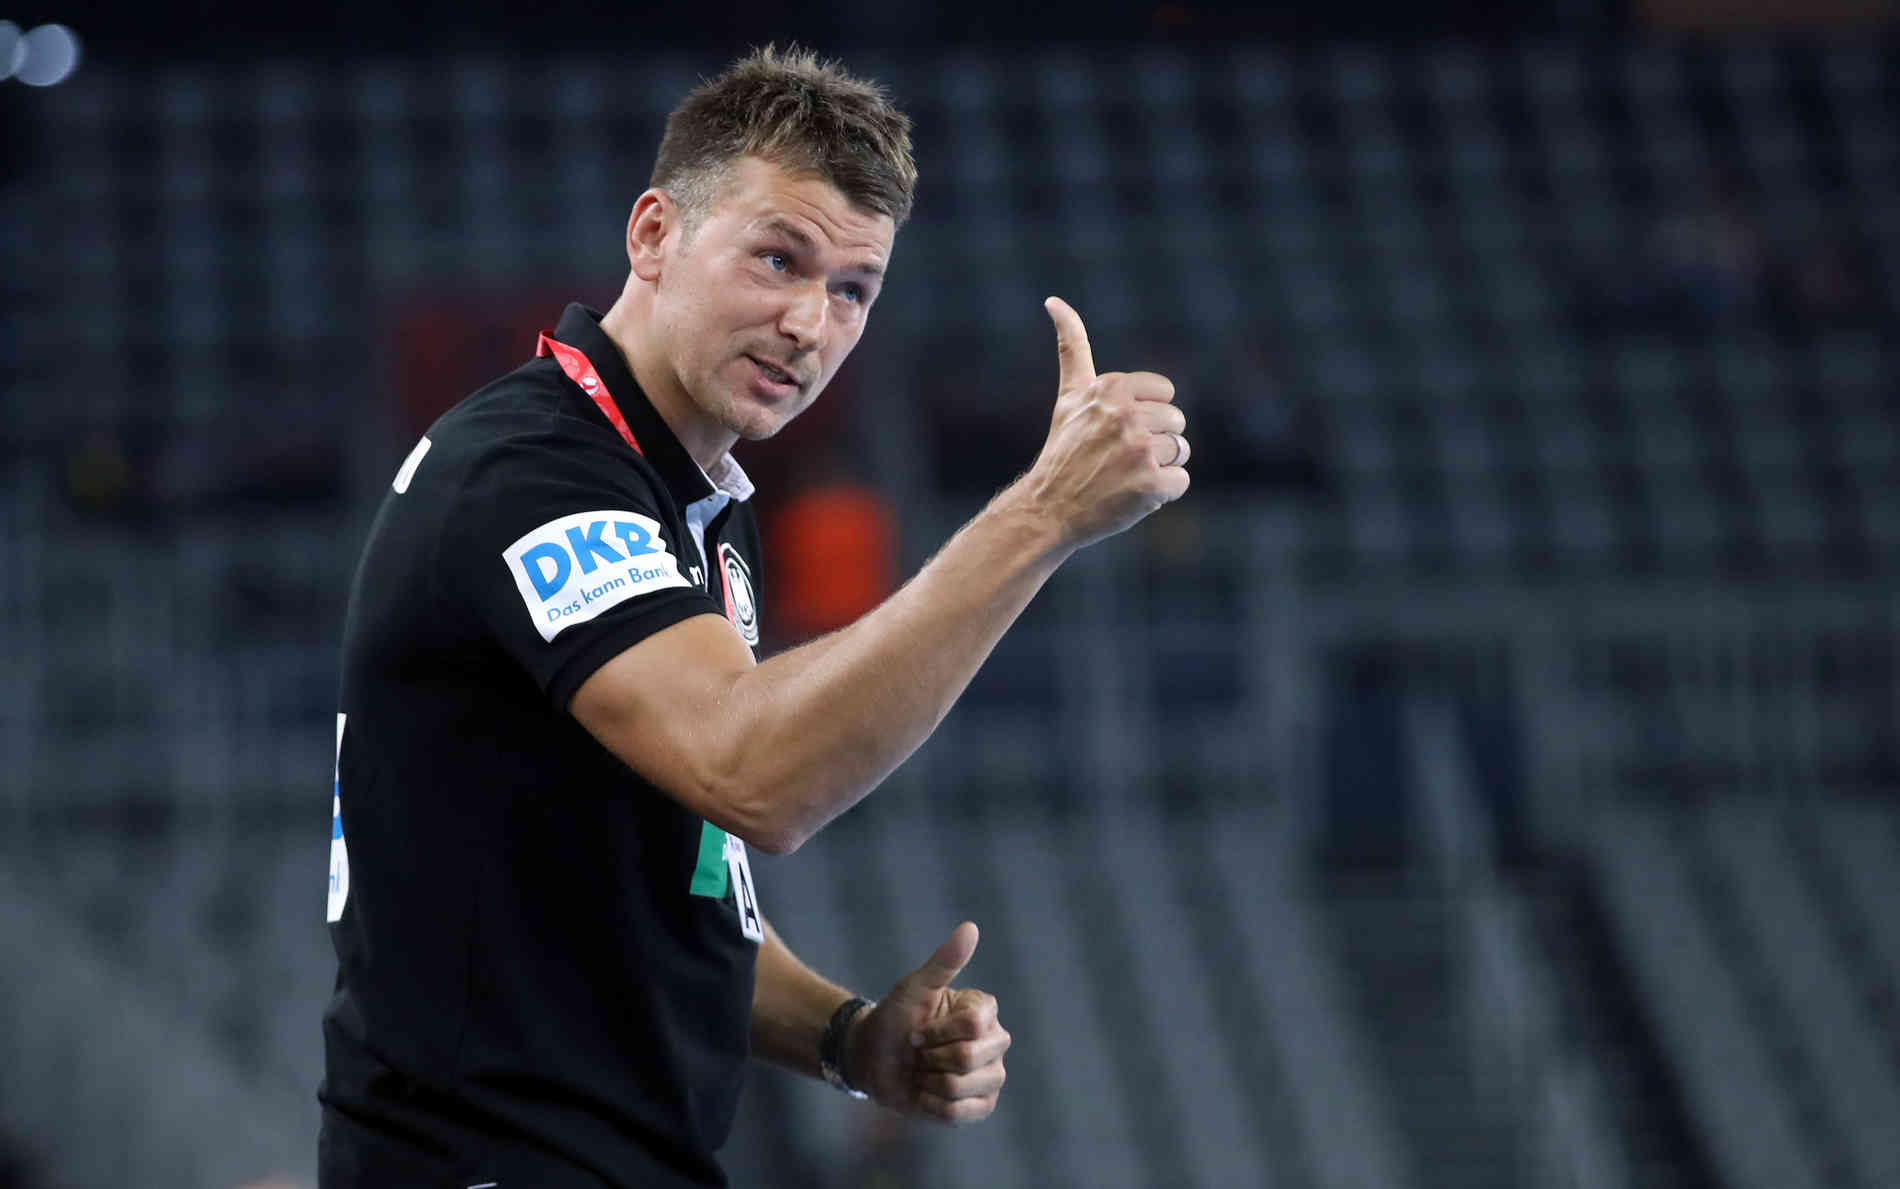 Handball Bundestrainer